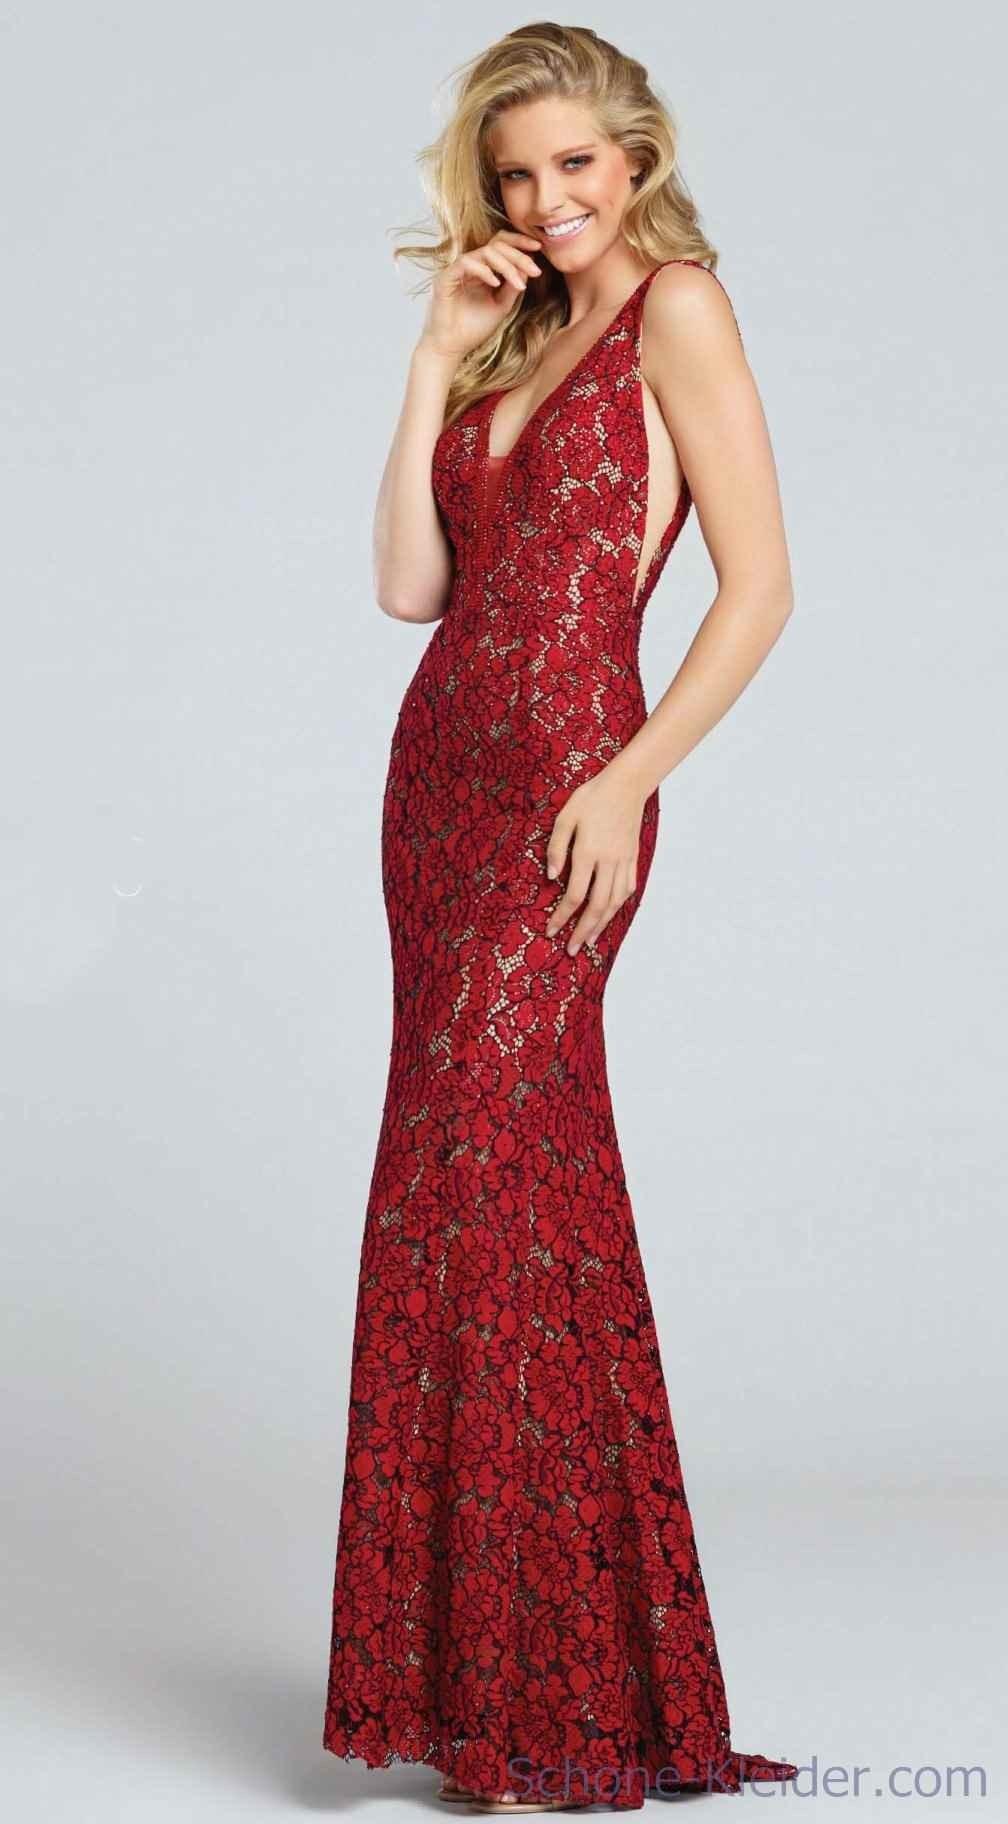 Designer Cool Wunderschöne Abendkleider Lang Boutique17 Großartig Wunderschöne Abendkleider Lang Bester Preis